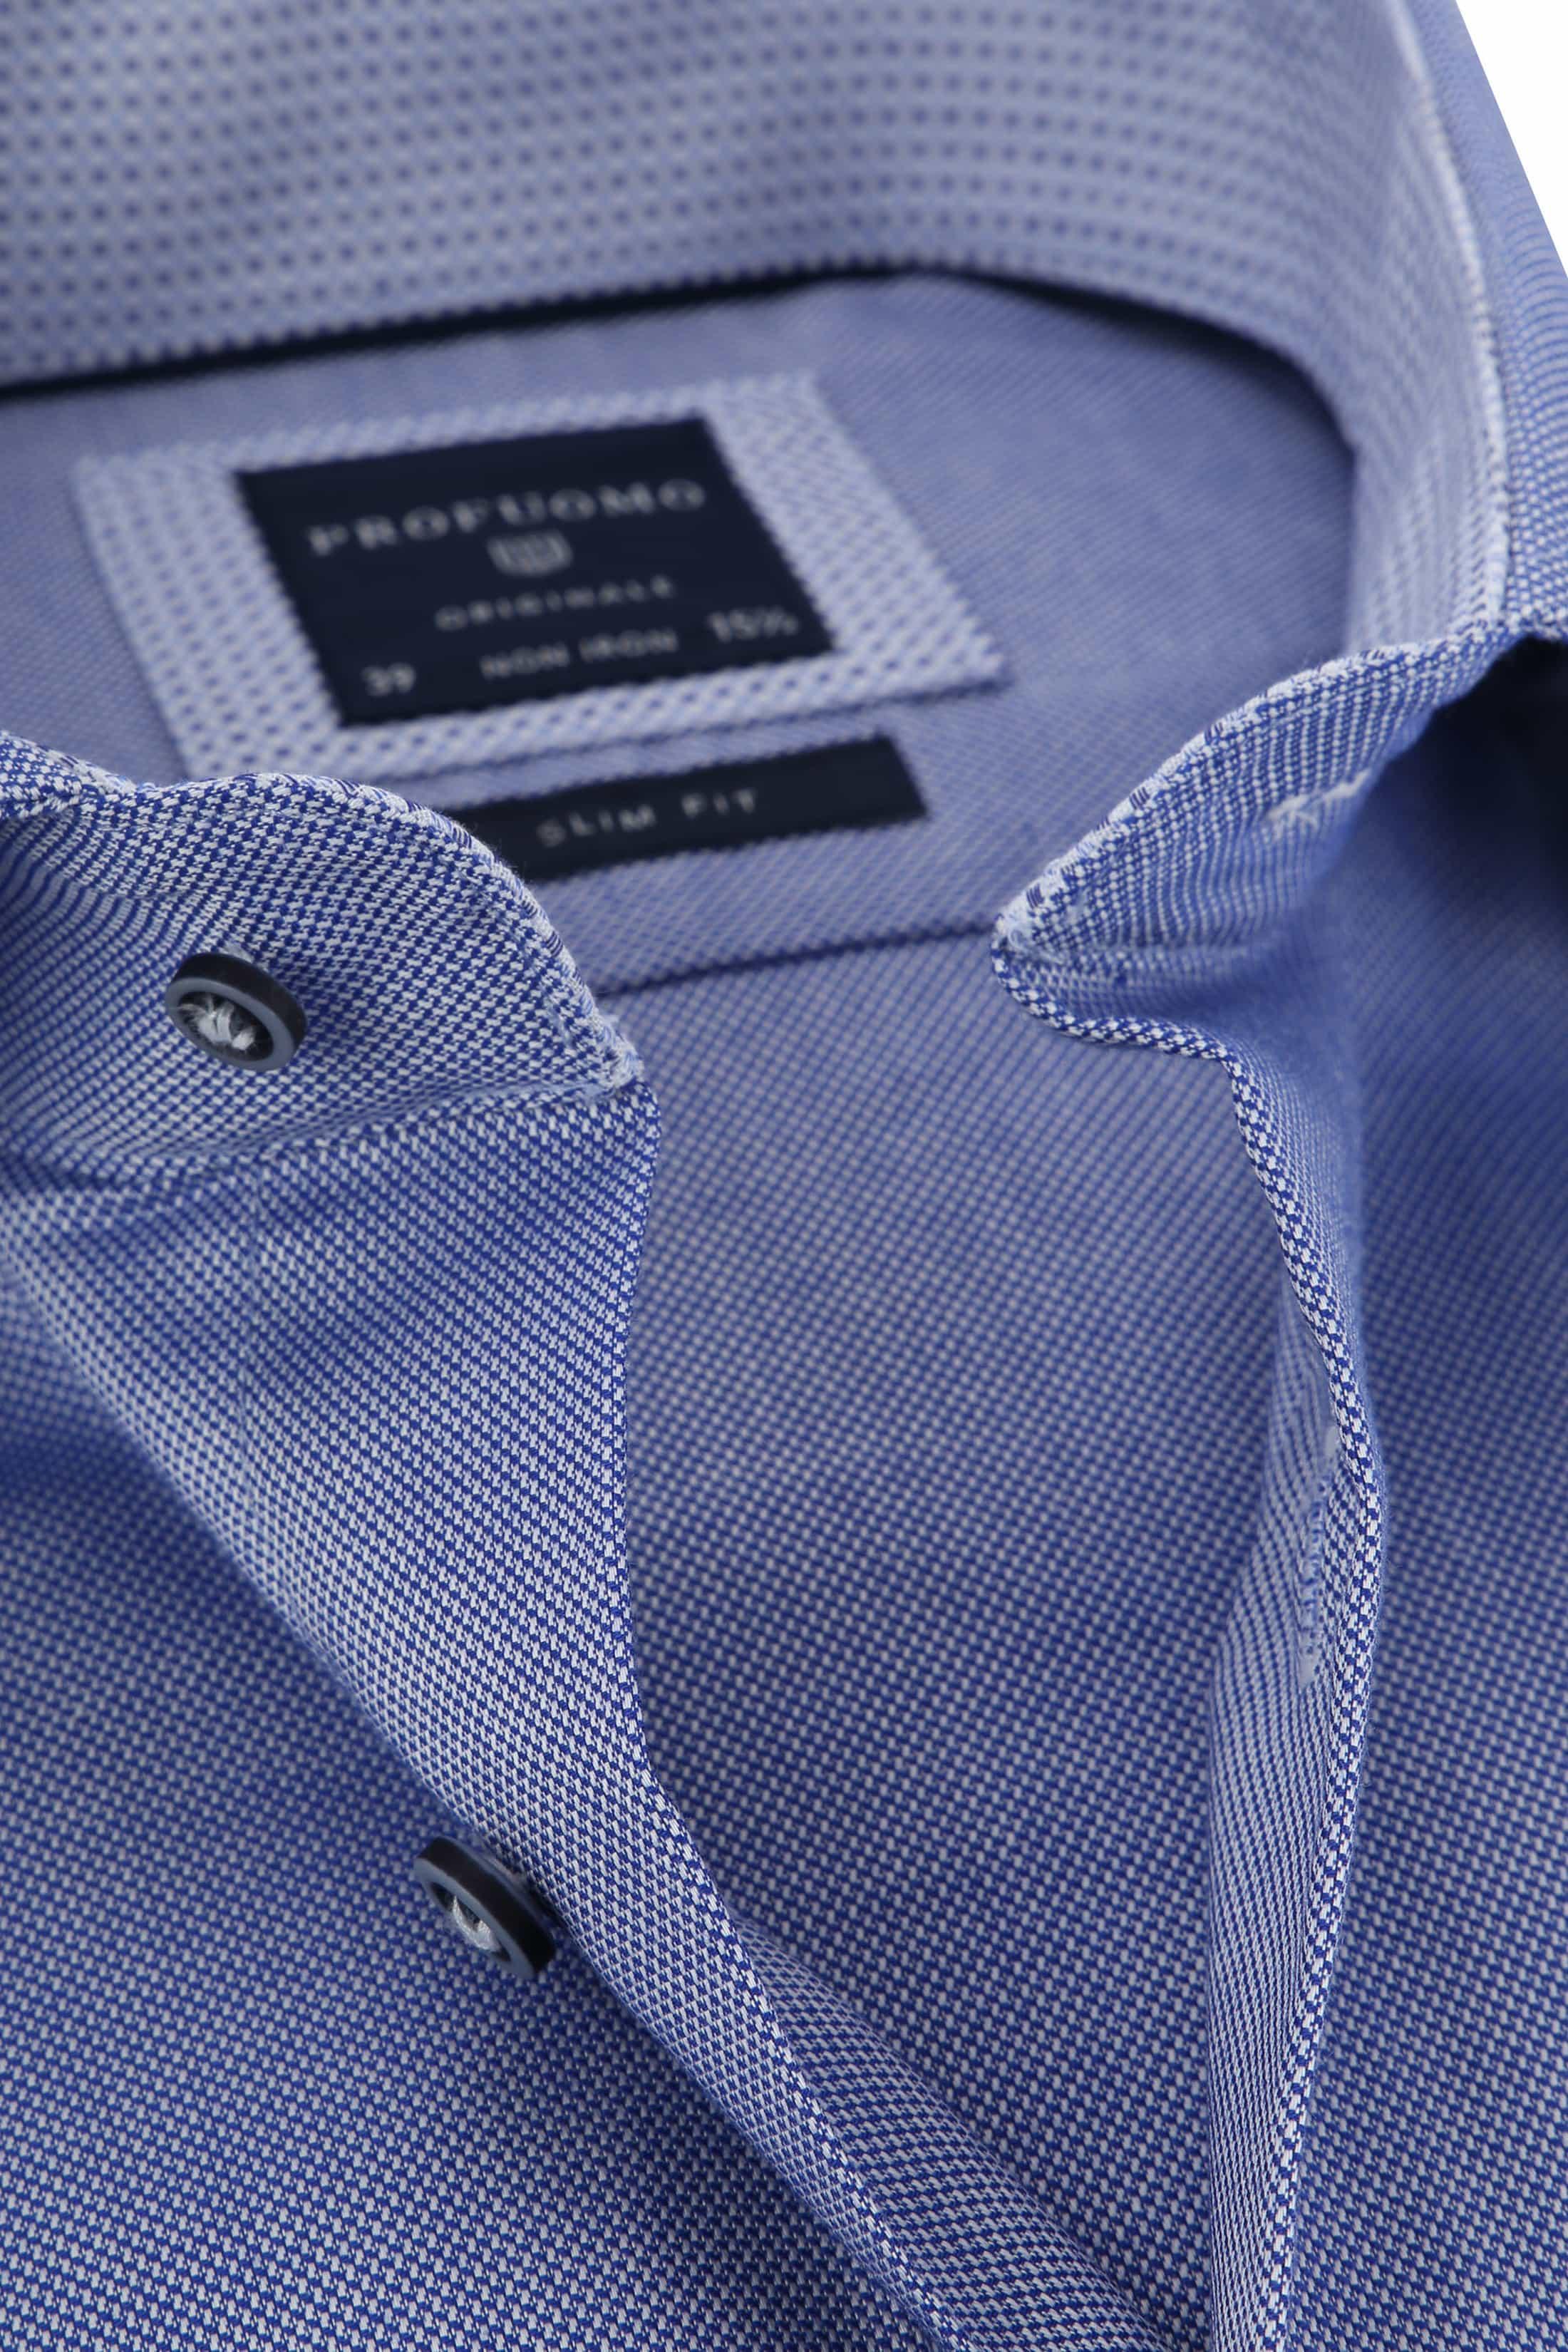 Profuomo Shirt Navy CAW foto 1